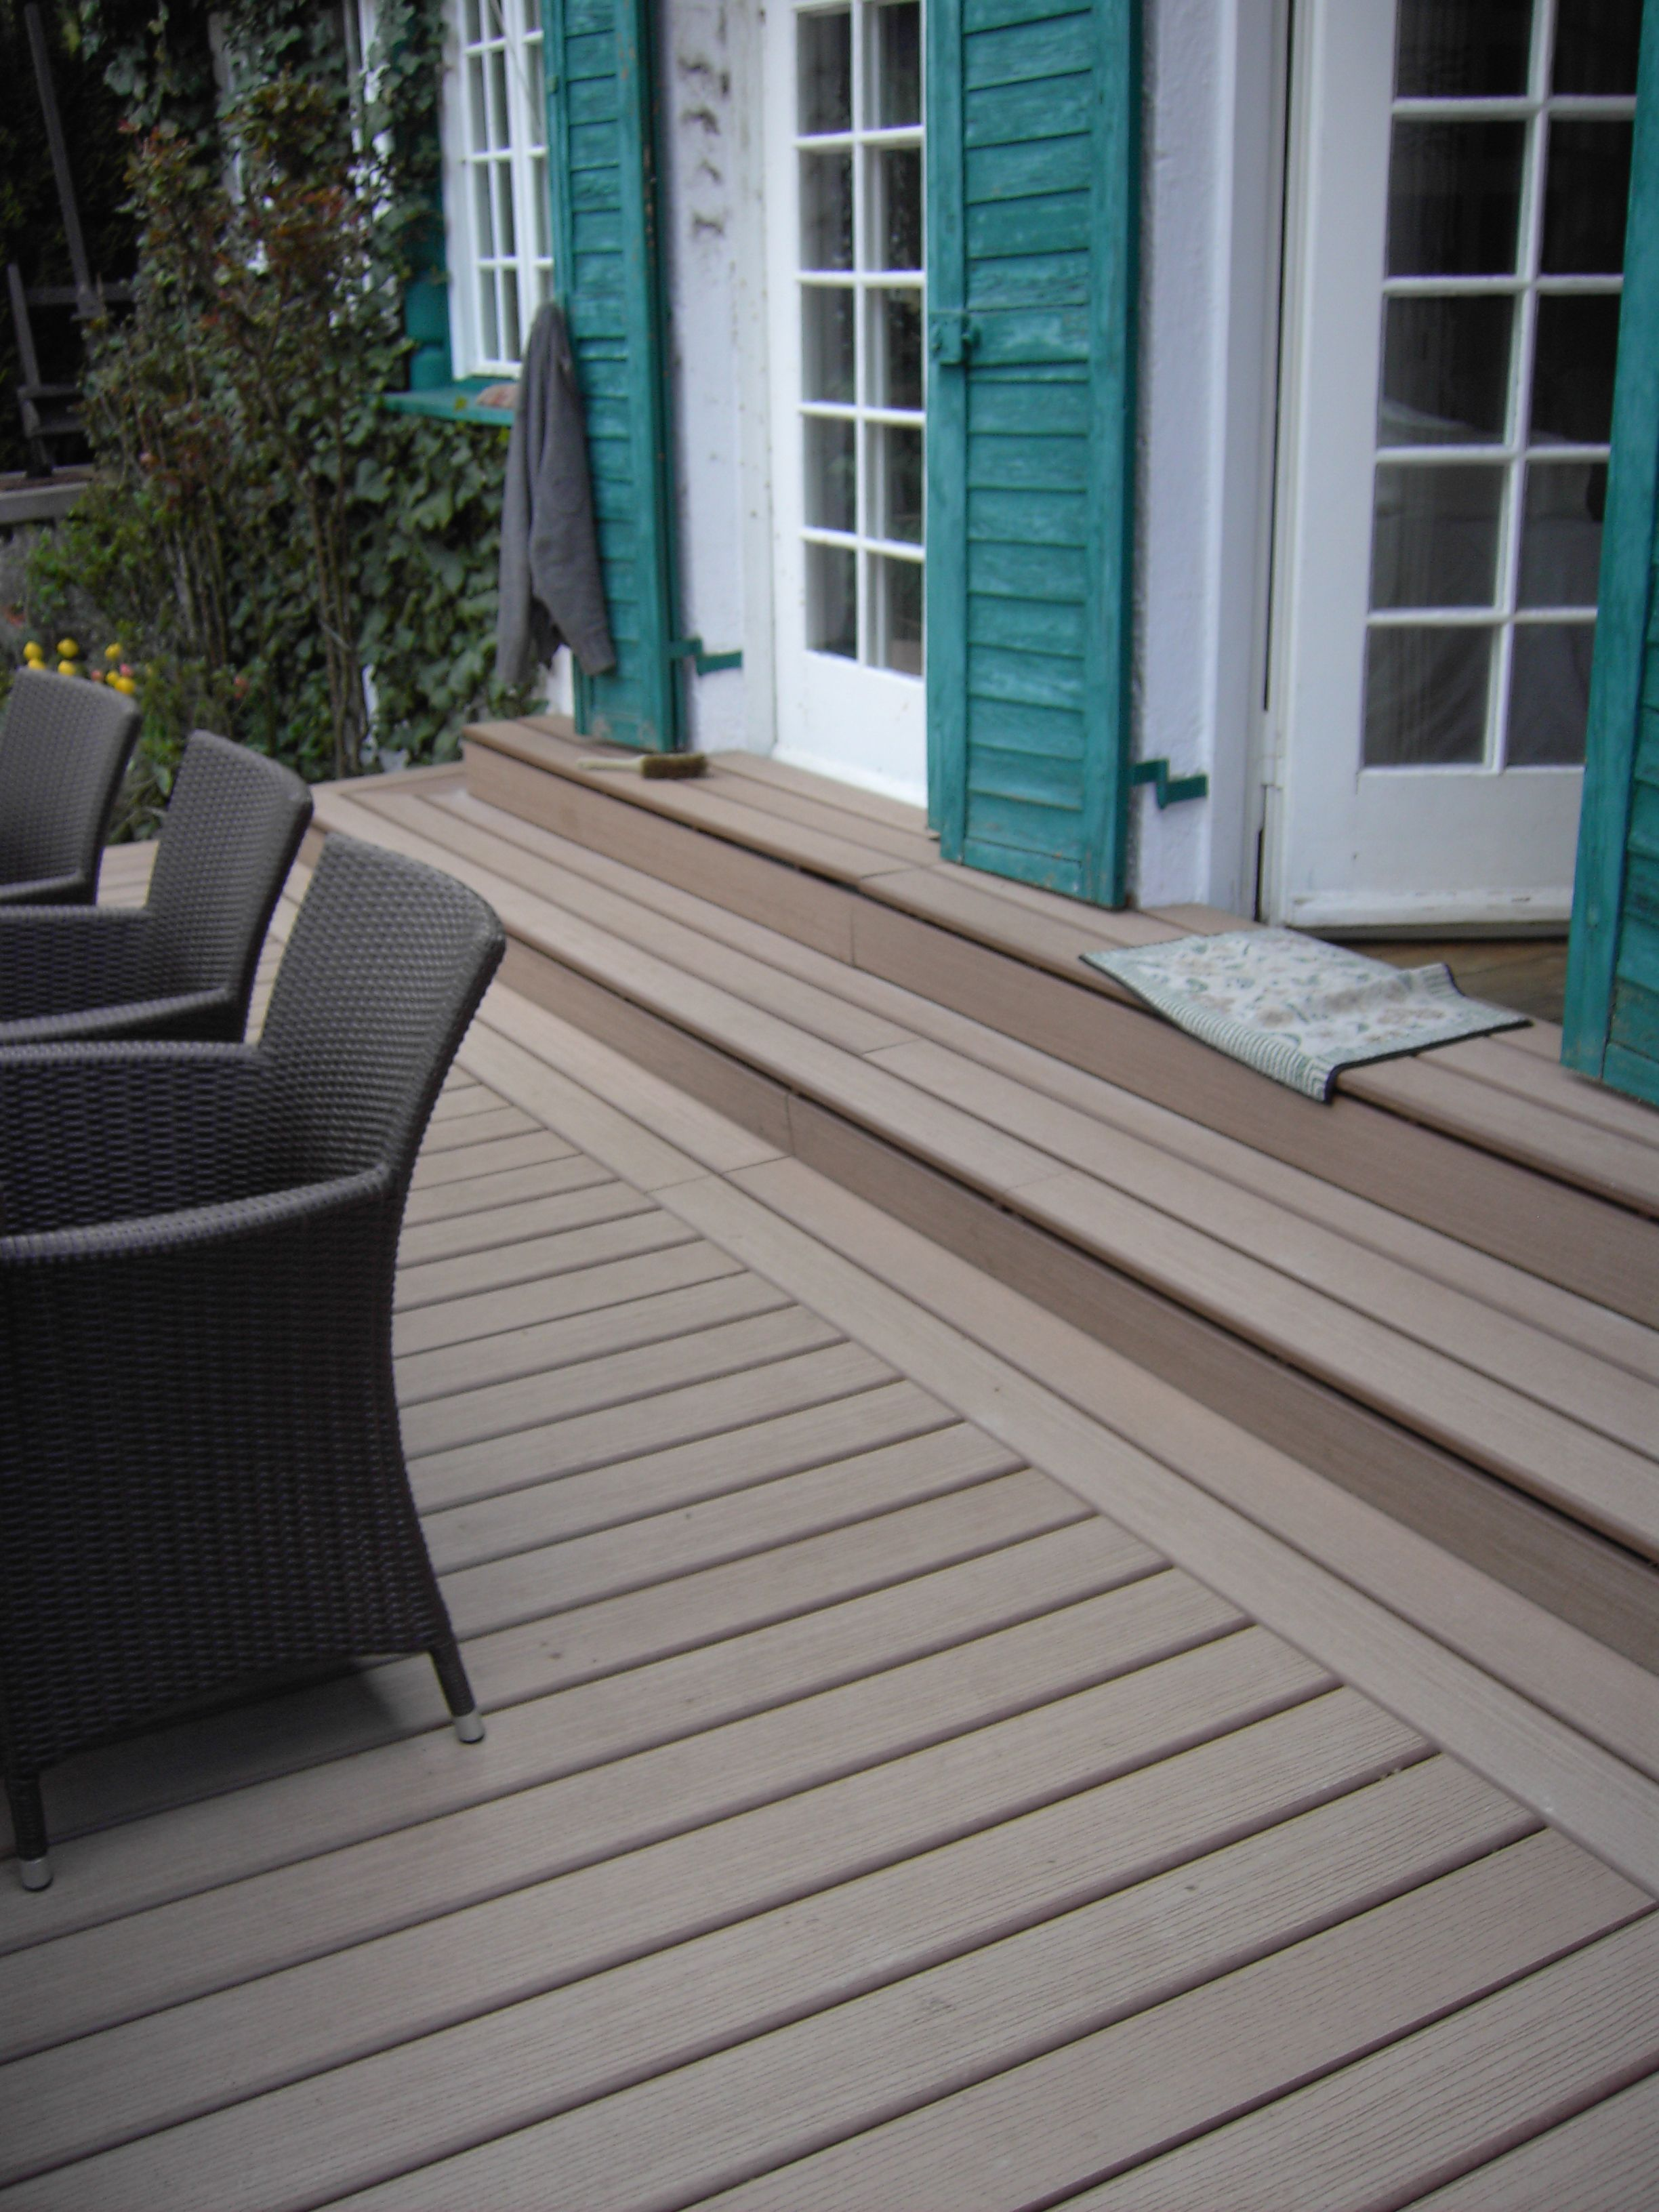 wpc terrasse | bpc terrassen | pinterest | garden, verandas and flooring